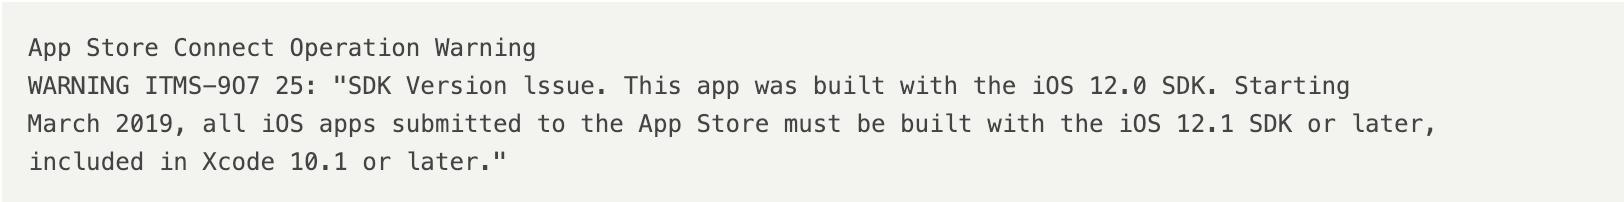 App打包上架过程中出现App Store Connect Operation Warning,问题的解决方法